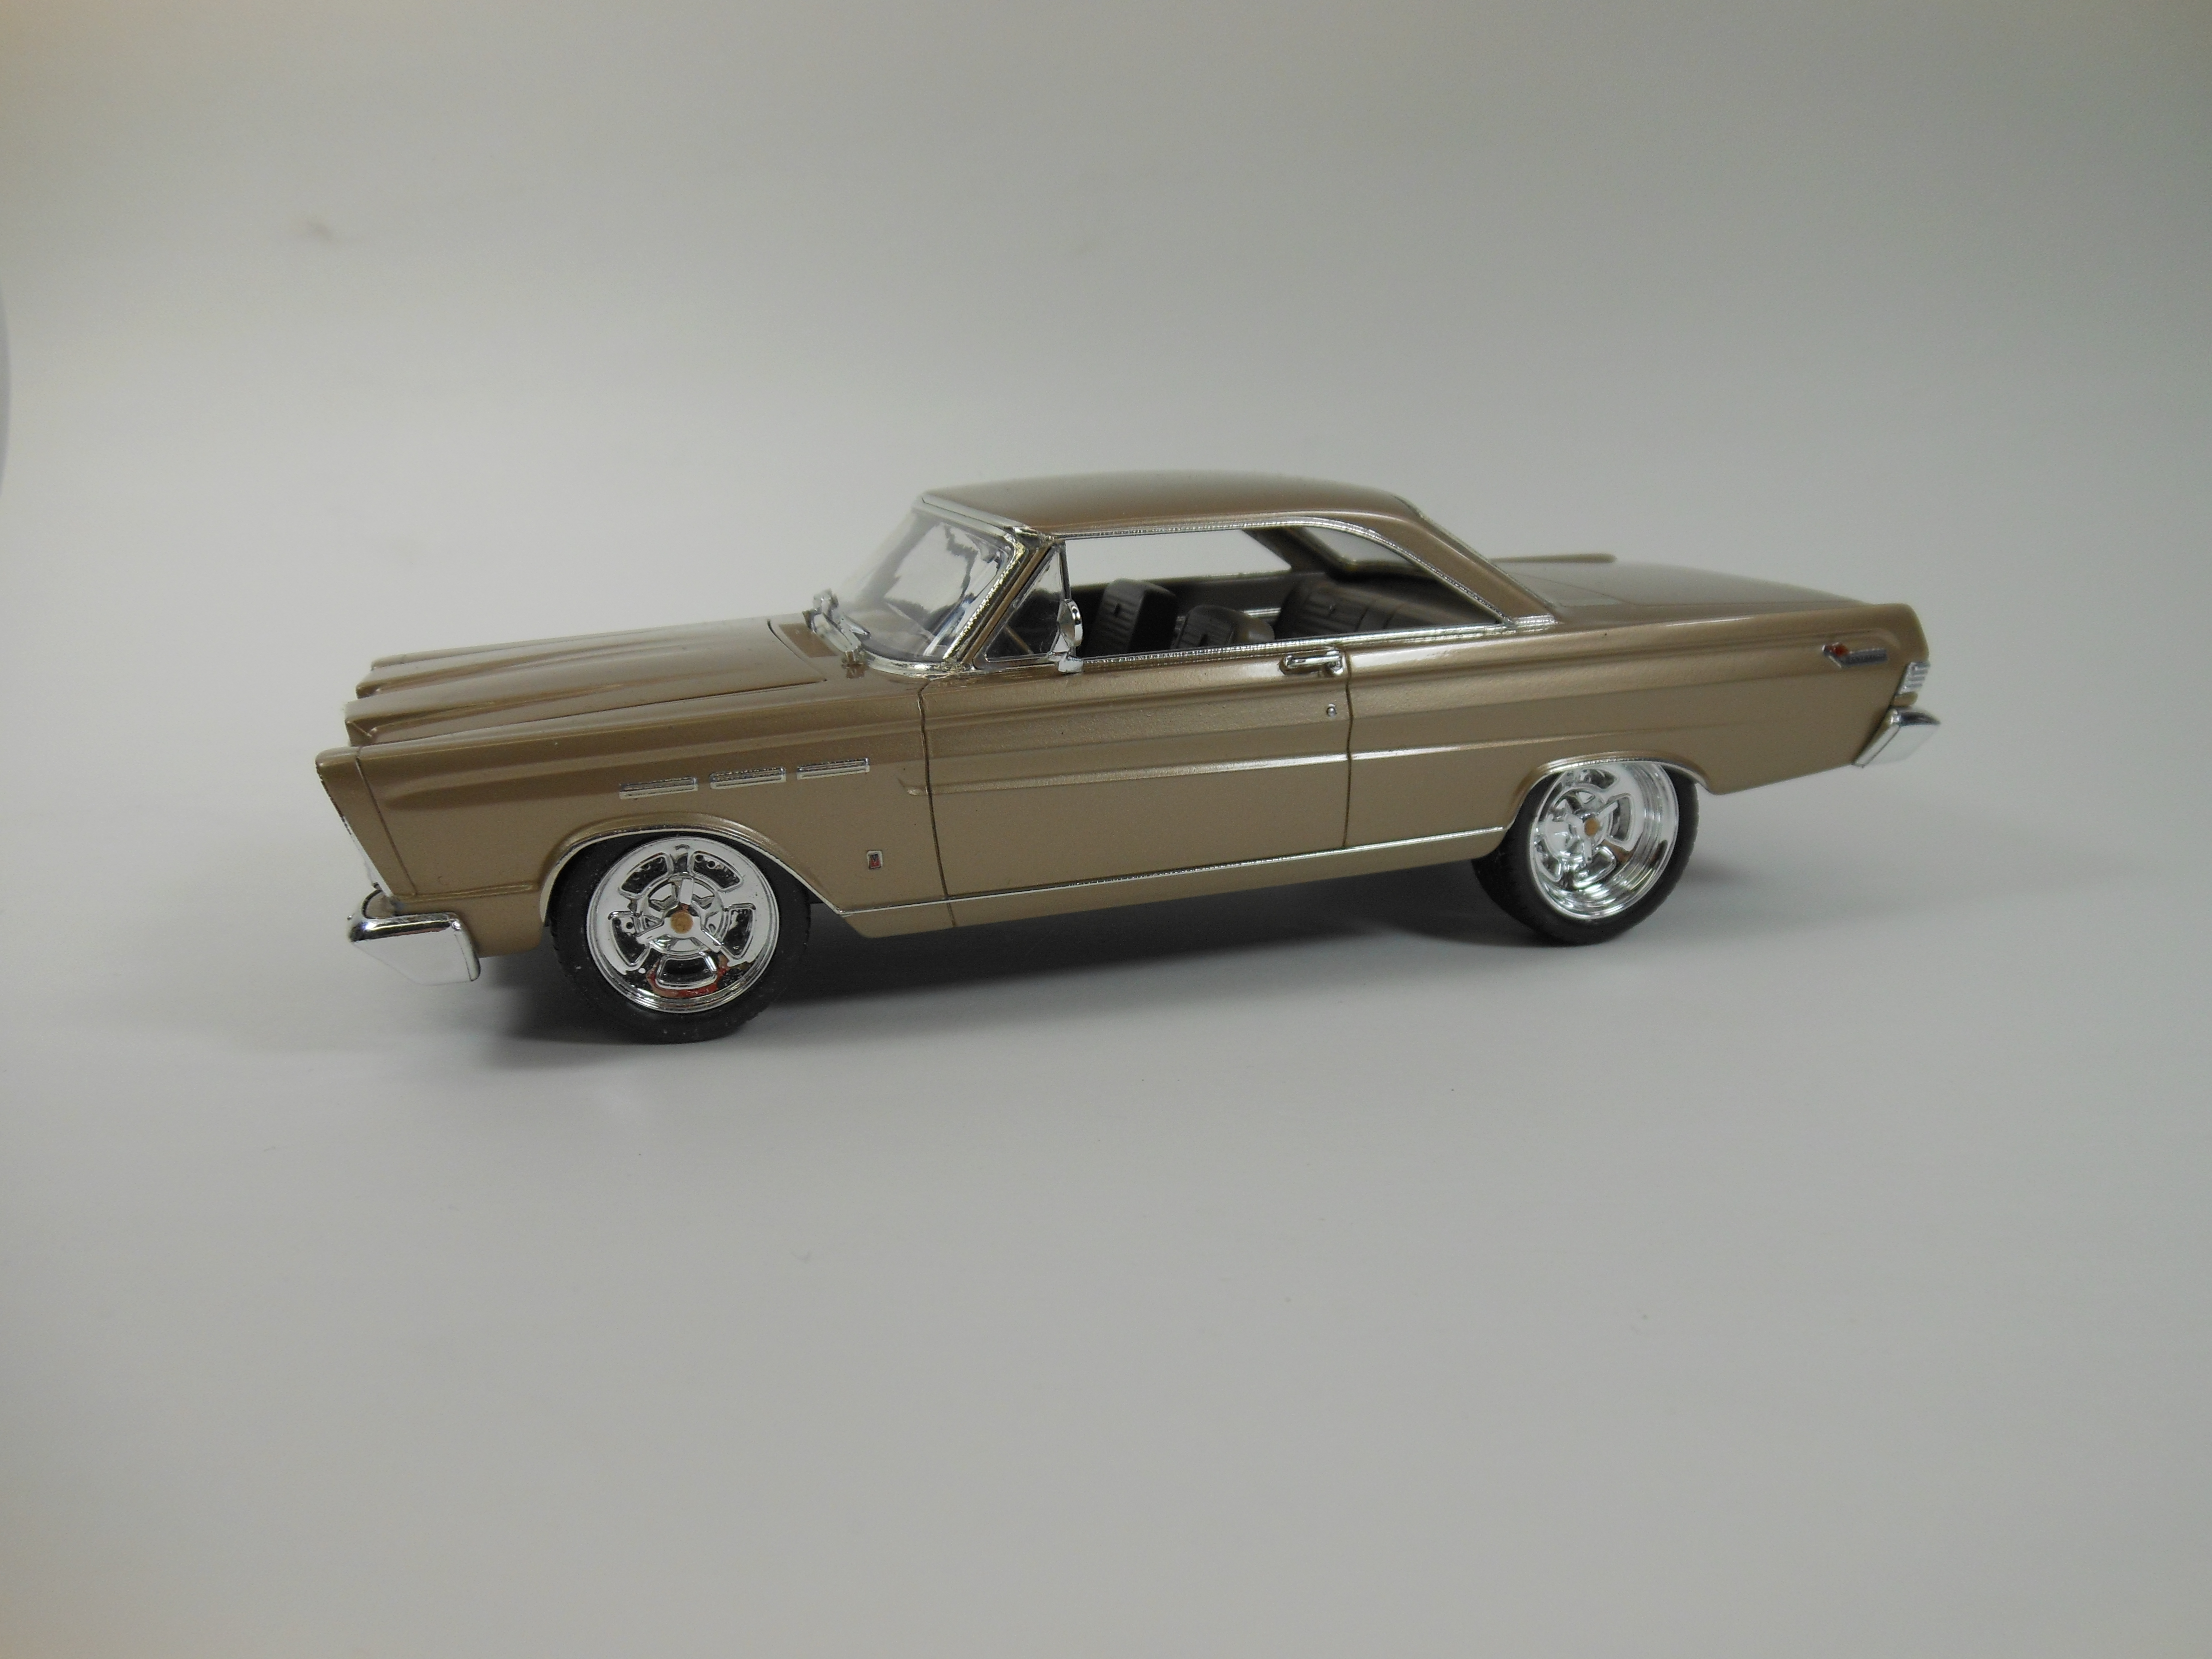 65 Comet Under Glass Model Cars Magazine Forum